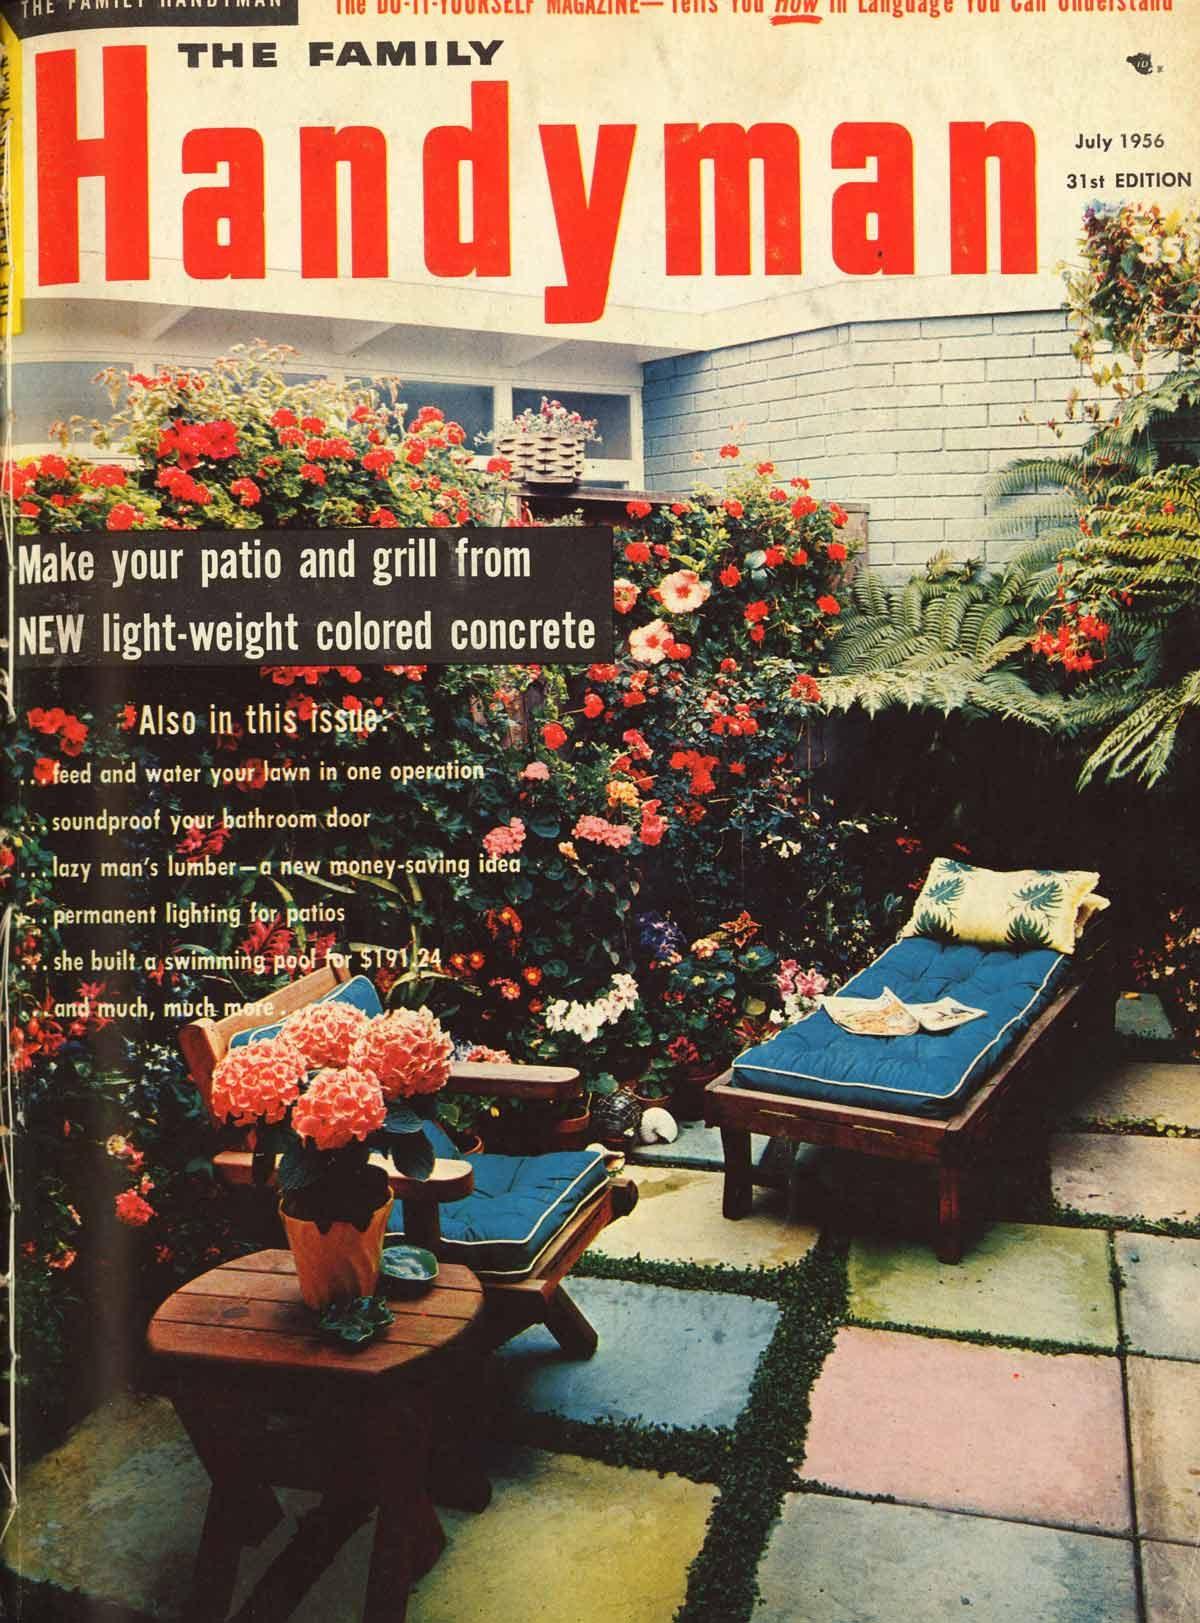 summer 1956 issue